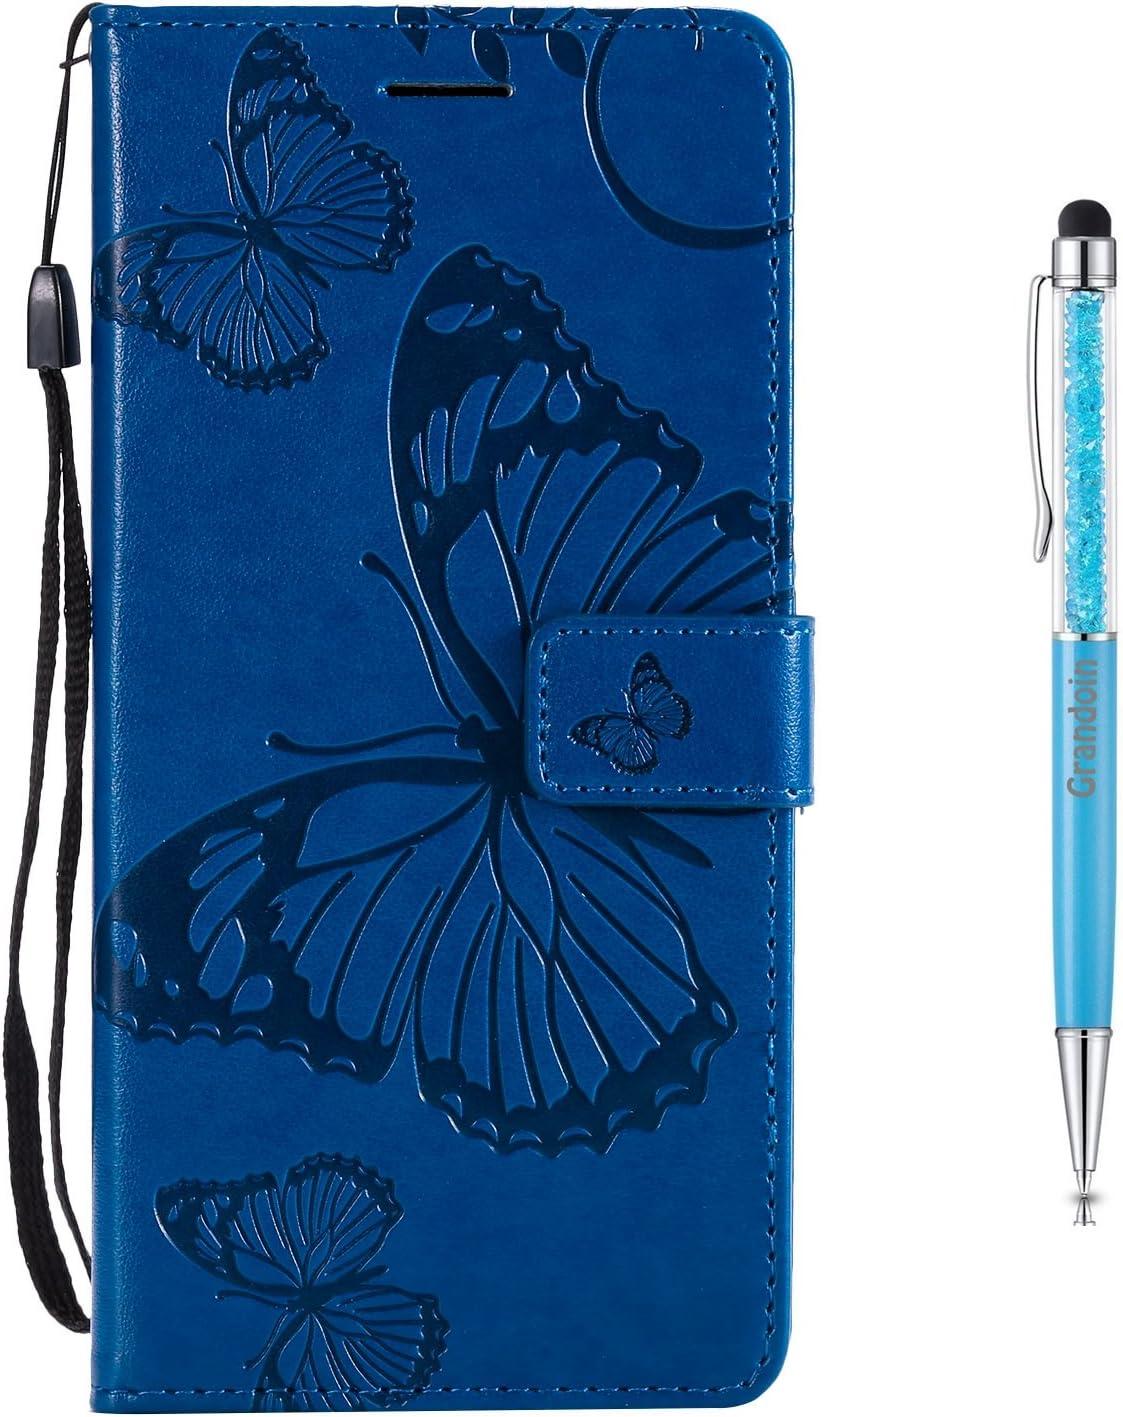 Grandoin Moto E4 Plus H/ülle Handyh/ülle im Brieftasche-Stil f/ür Motorola Moto E4 Plus Handytasche PU Leder Flip Cover Schmetterling Muster Design Premium Book Case Schutzh/ülle Etui Case Gr/ün